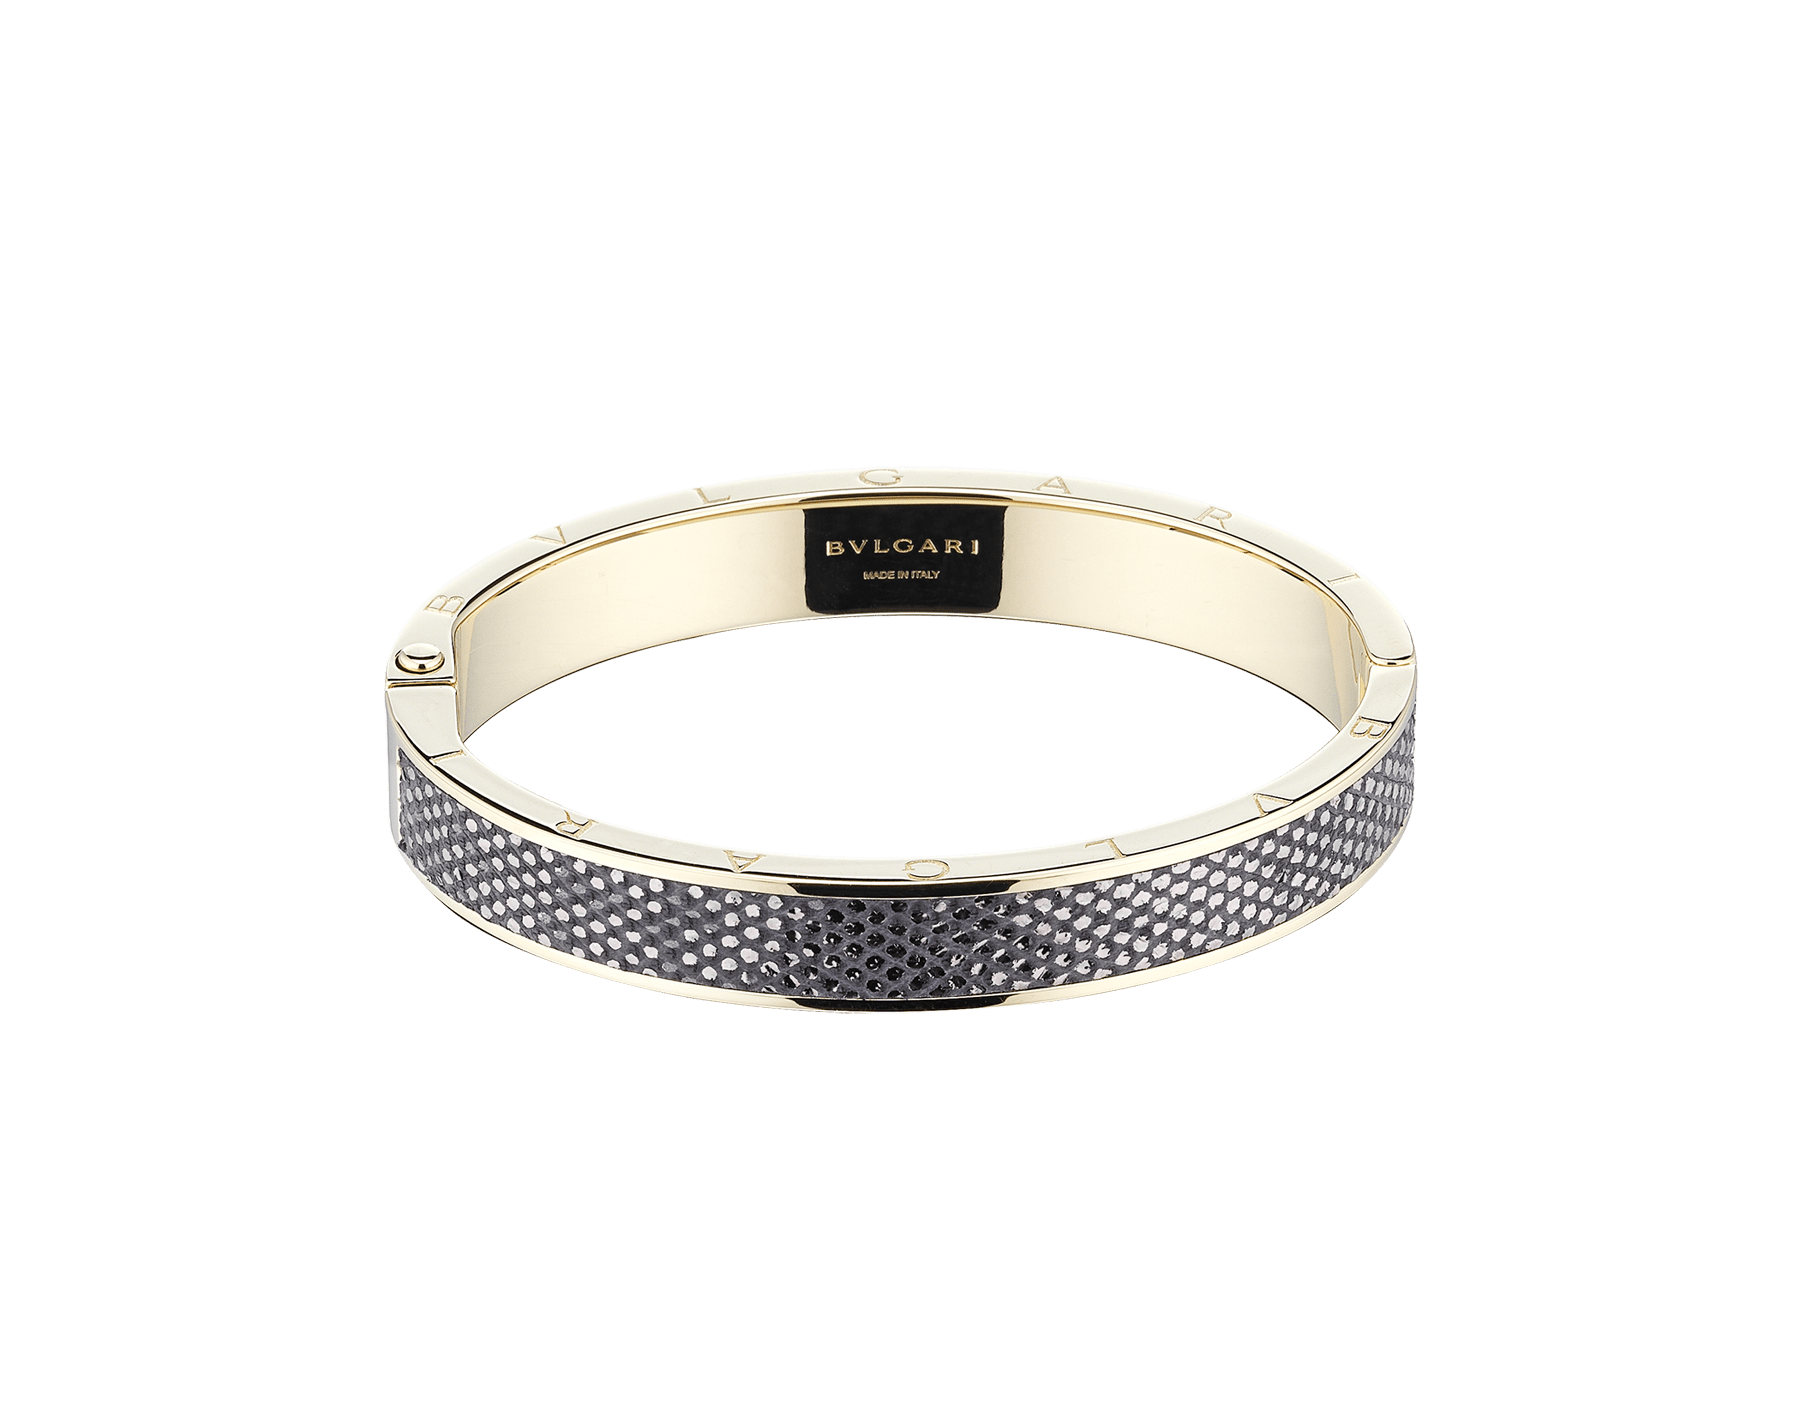 """BVLGARI BVLGARI"" bangle bracelet in light gold-plated brass with a Charcoal Diamond grey metallic karung skin insert and a BVLGARI logo hinge closure. Logo engraving along the edges of both sides of the bracelet and in the inner part. HINGELOGOBRACLT-MK-CD image 1"